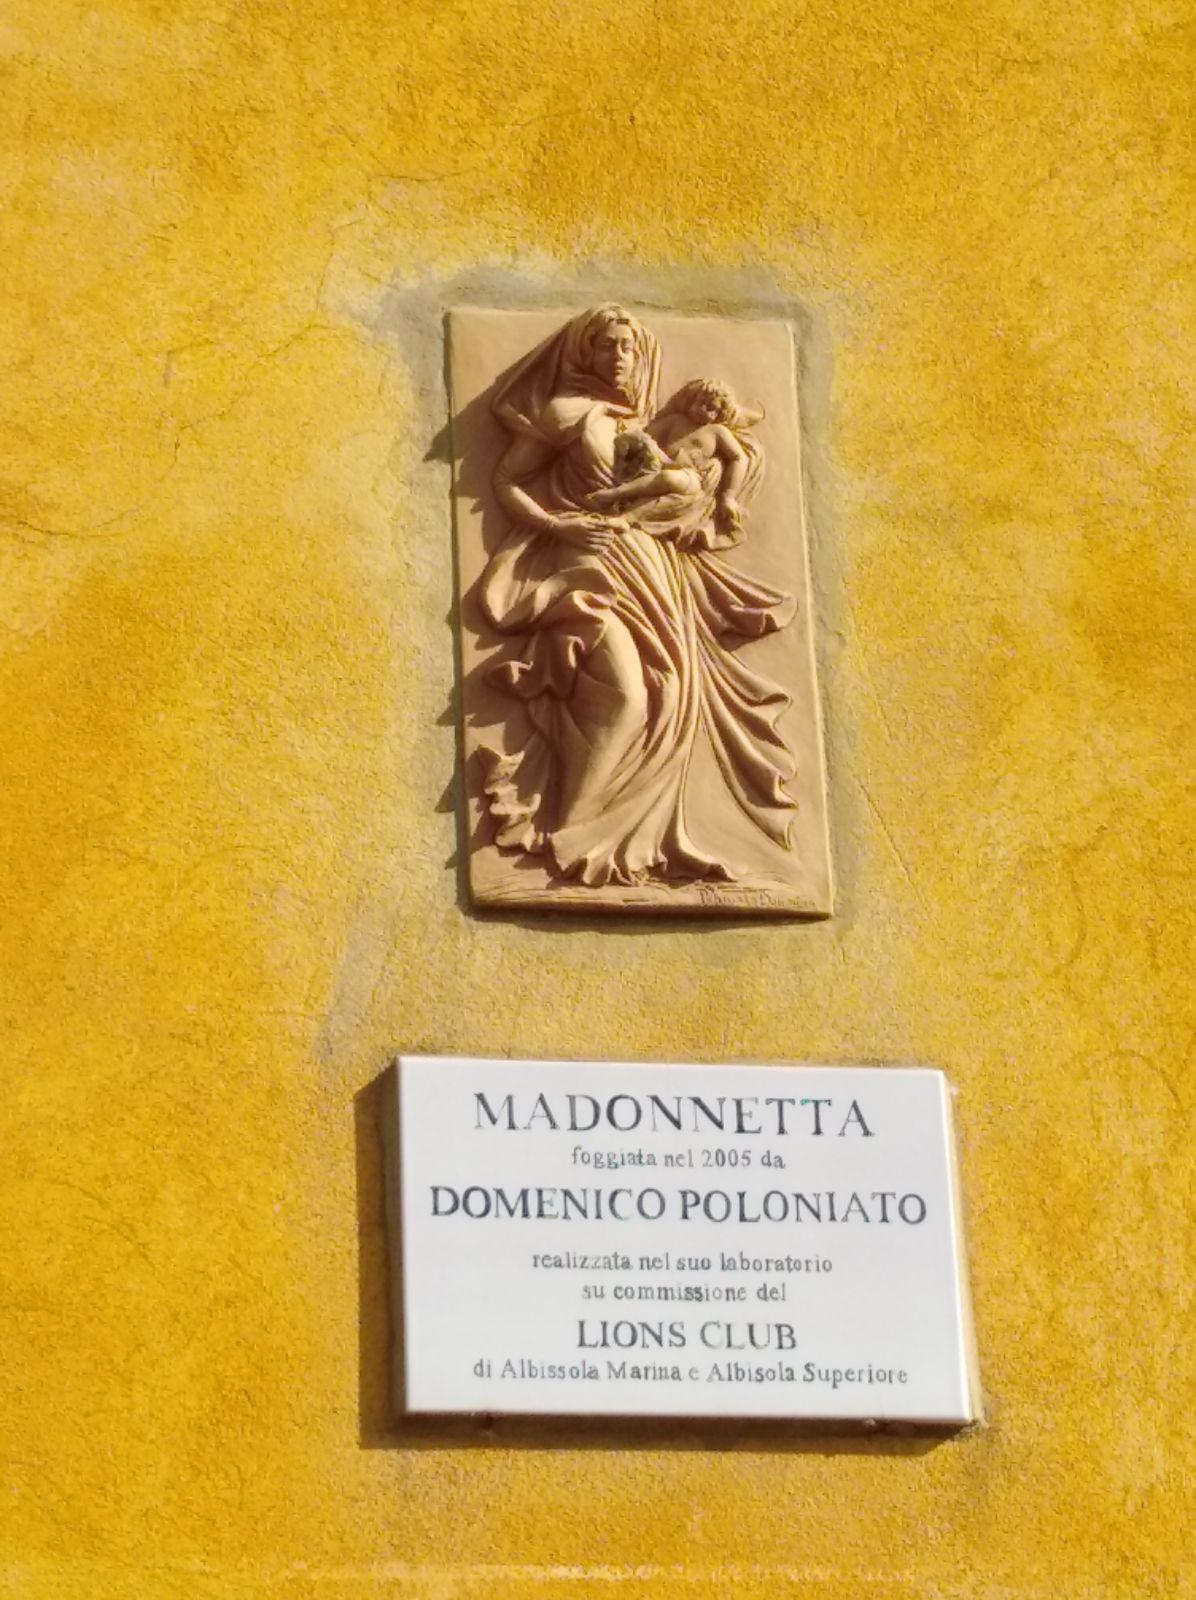 La Madonnetta